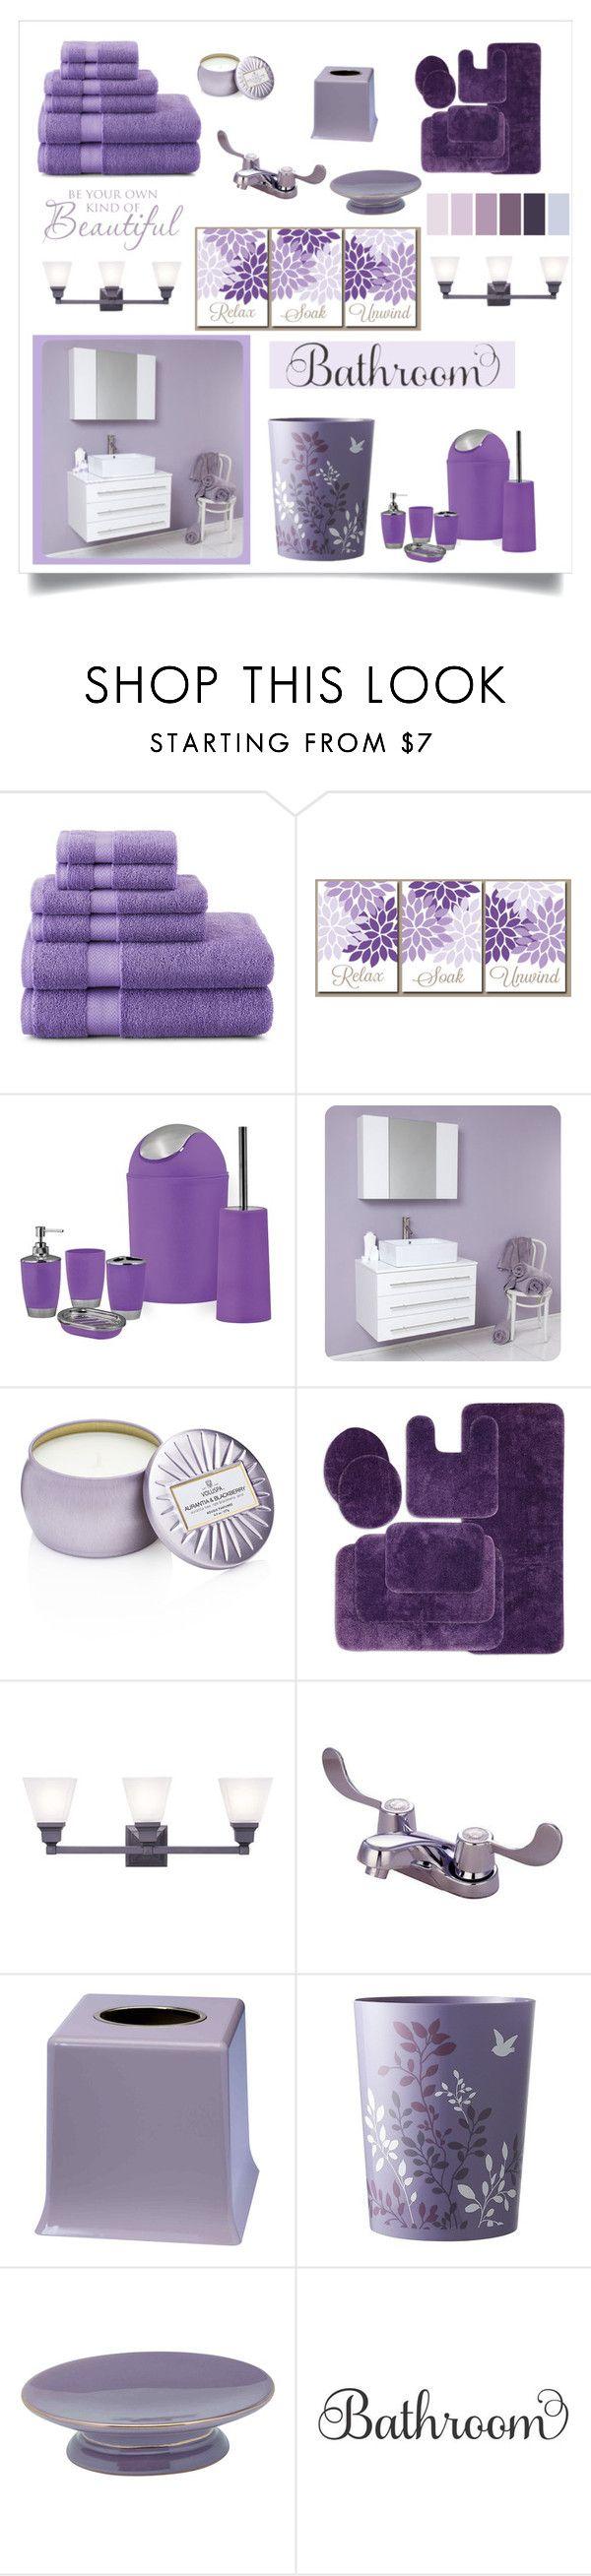 Best 25+ Lavender bathroom ideas on Pinterest | Lilac bathroom ...